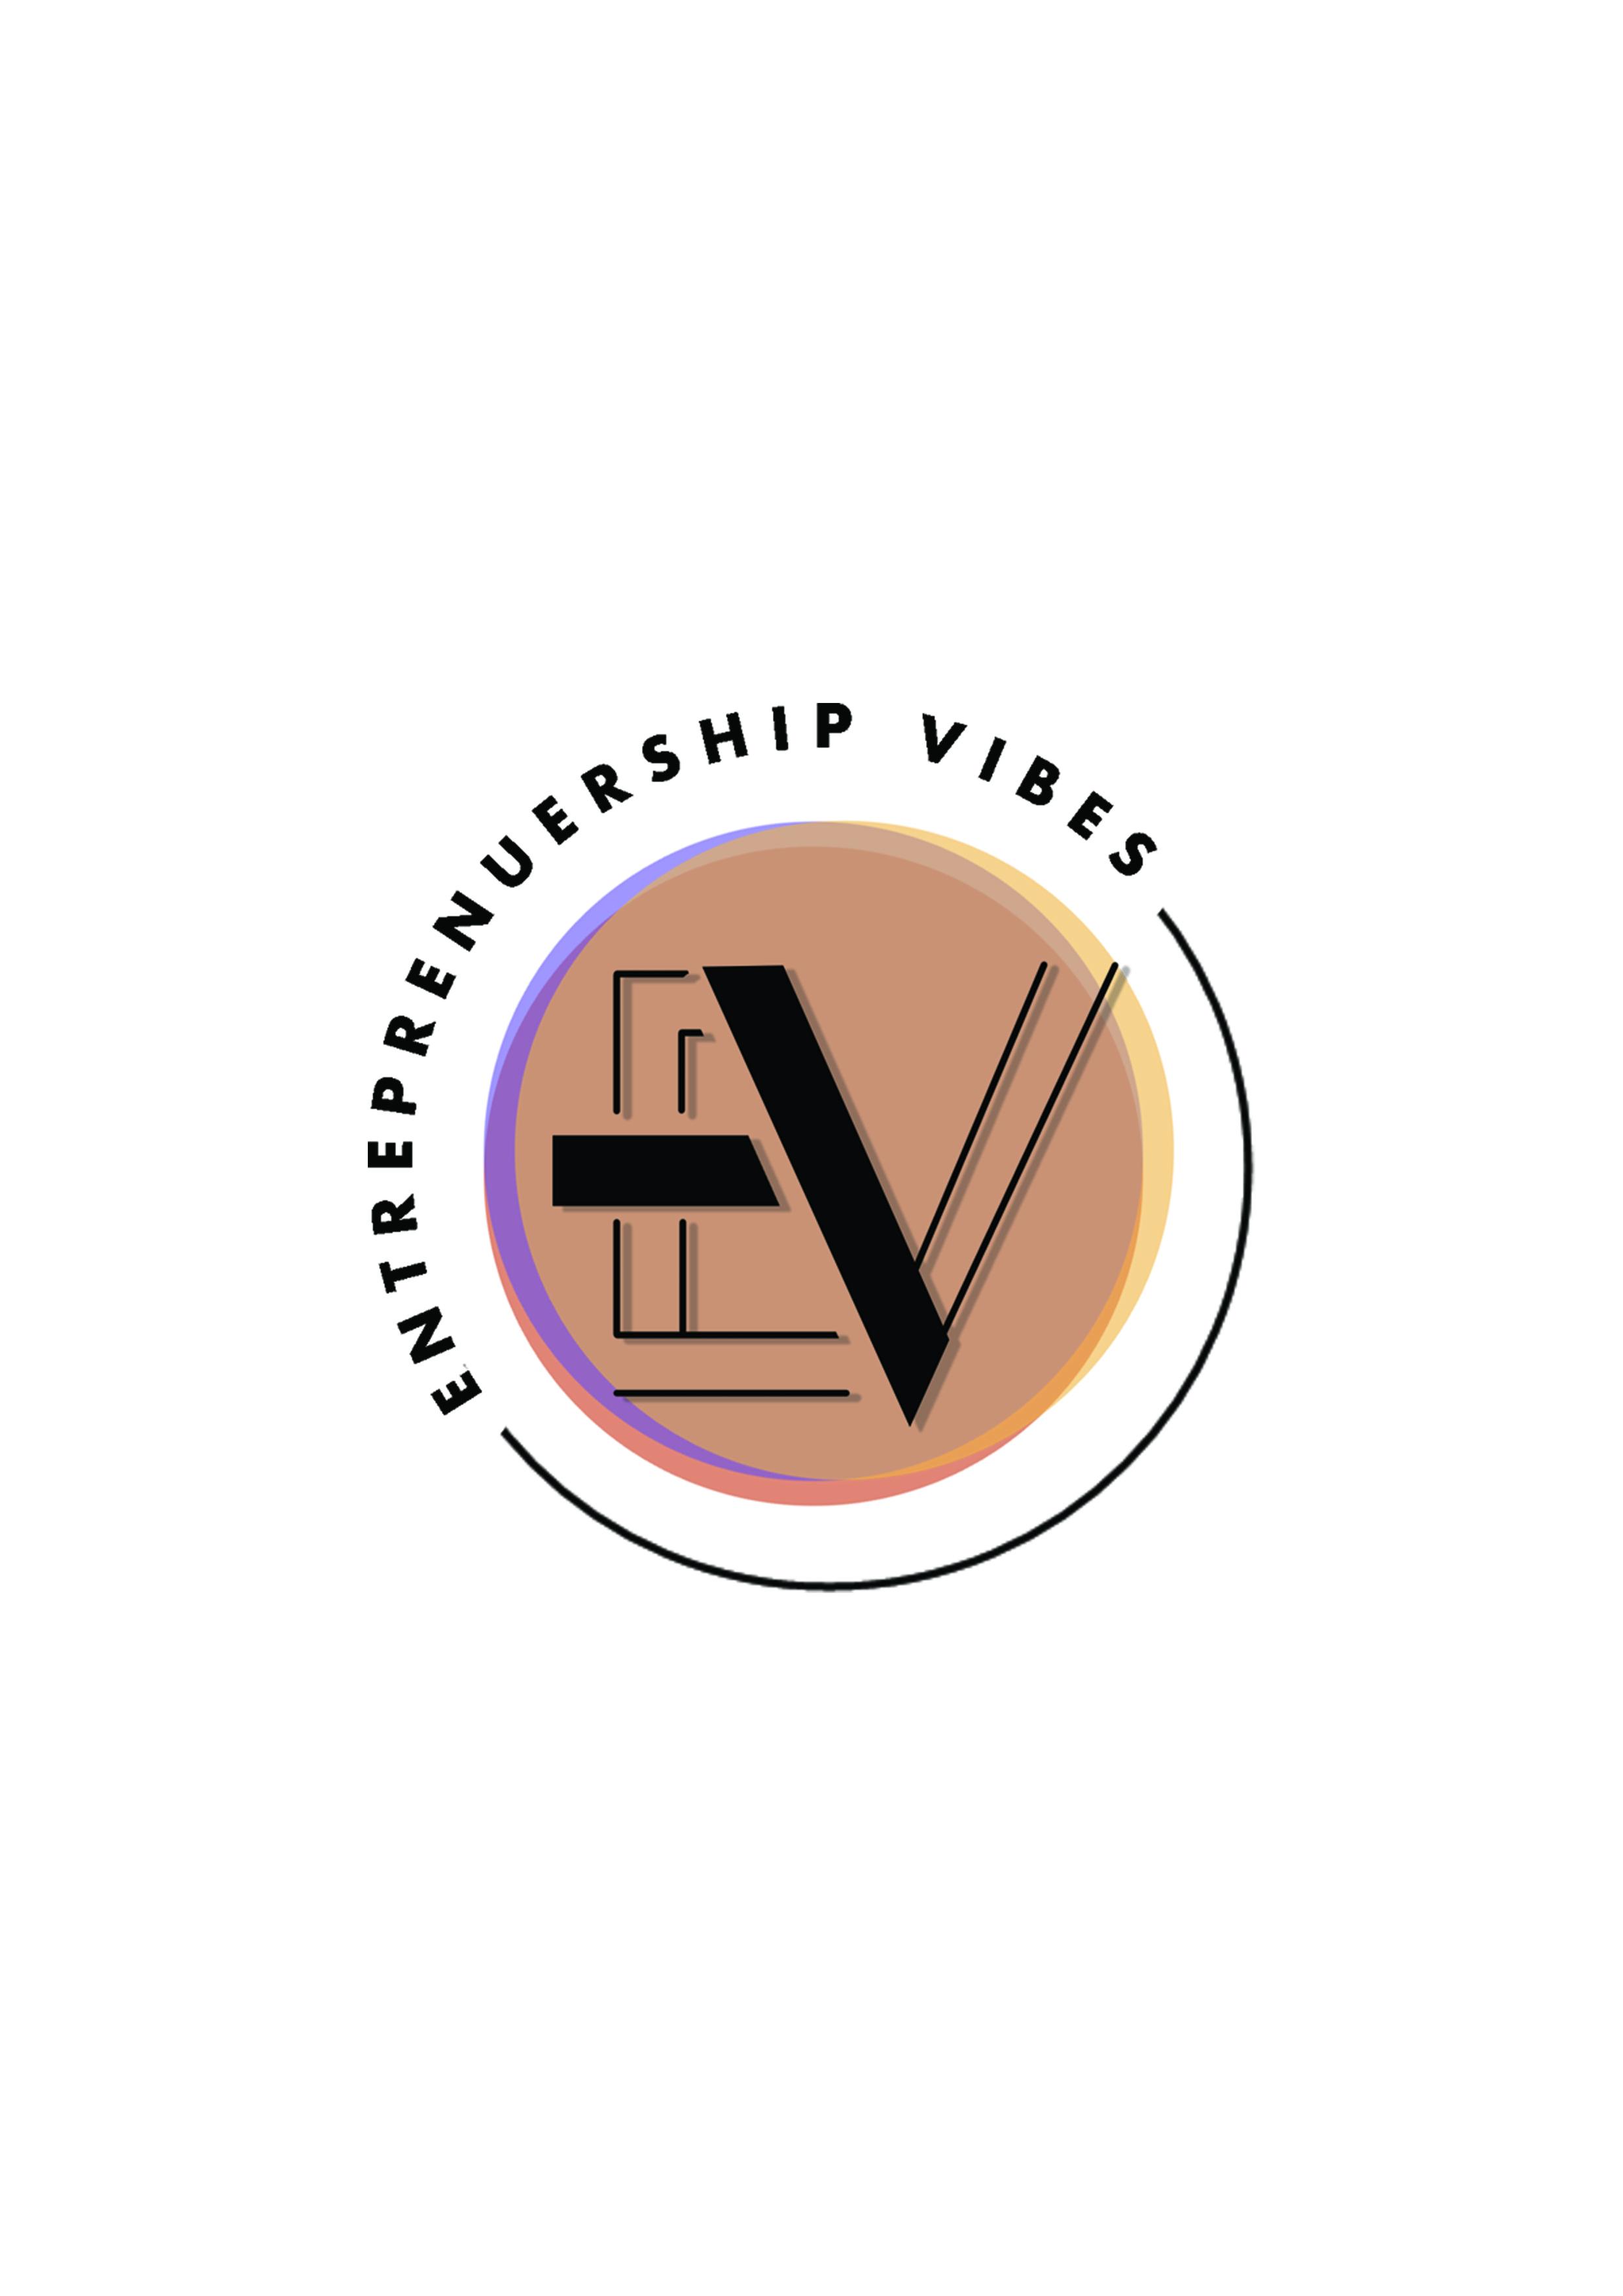 Entrepreneurship Vibes 2020 inspires students to begin the journey towards starting their own business